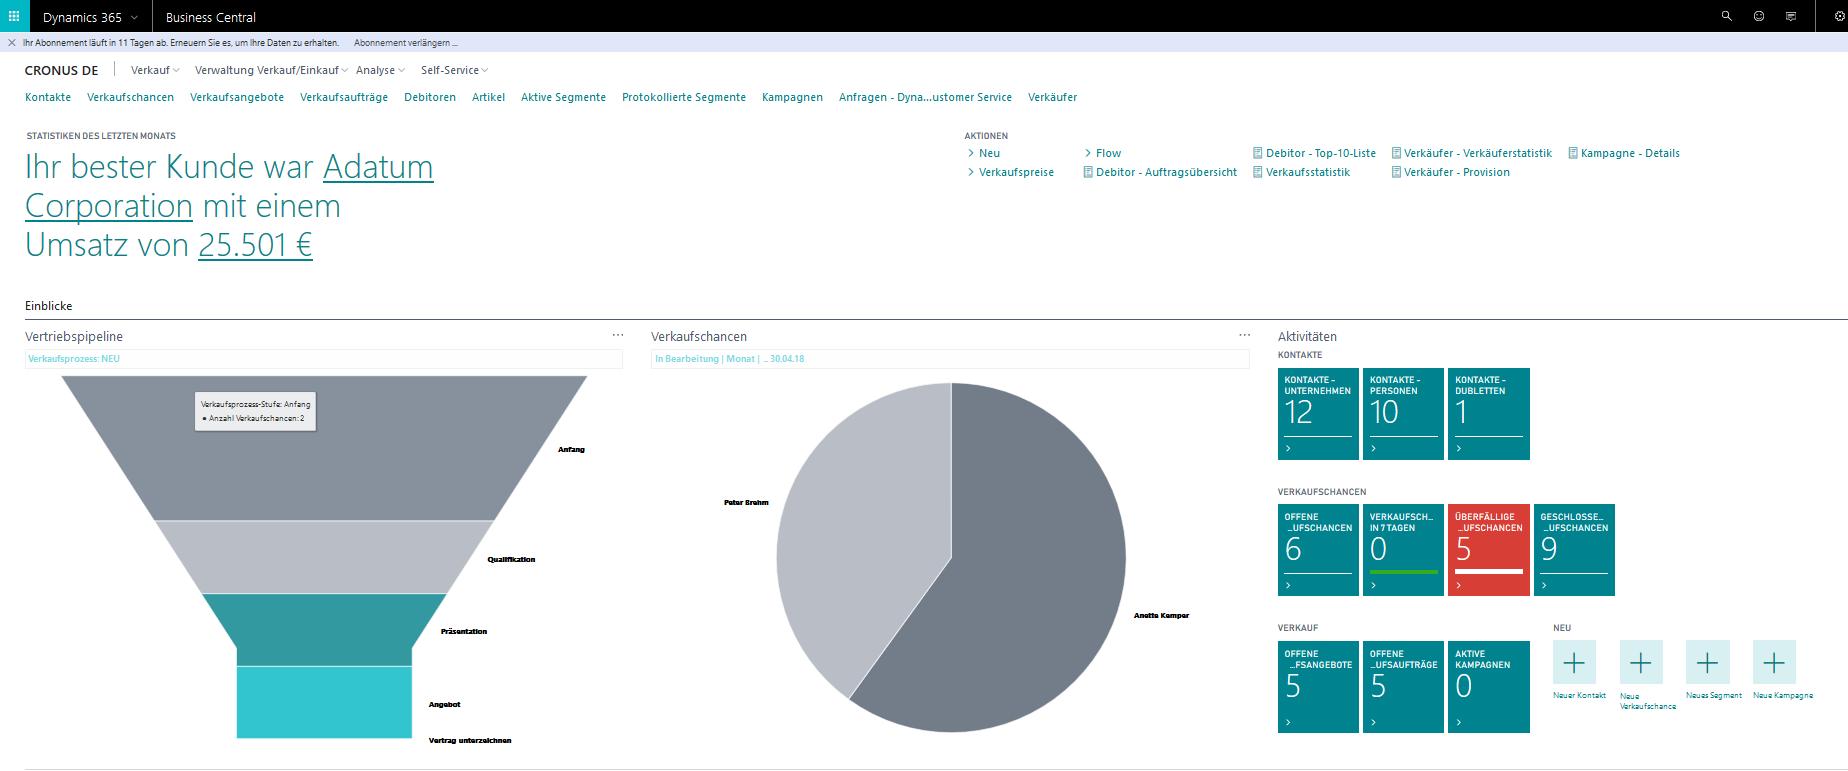 Abbildung 1: Dynamics 365 Business Central Dashboard